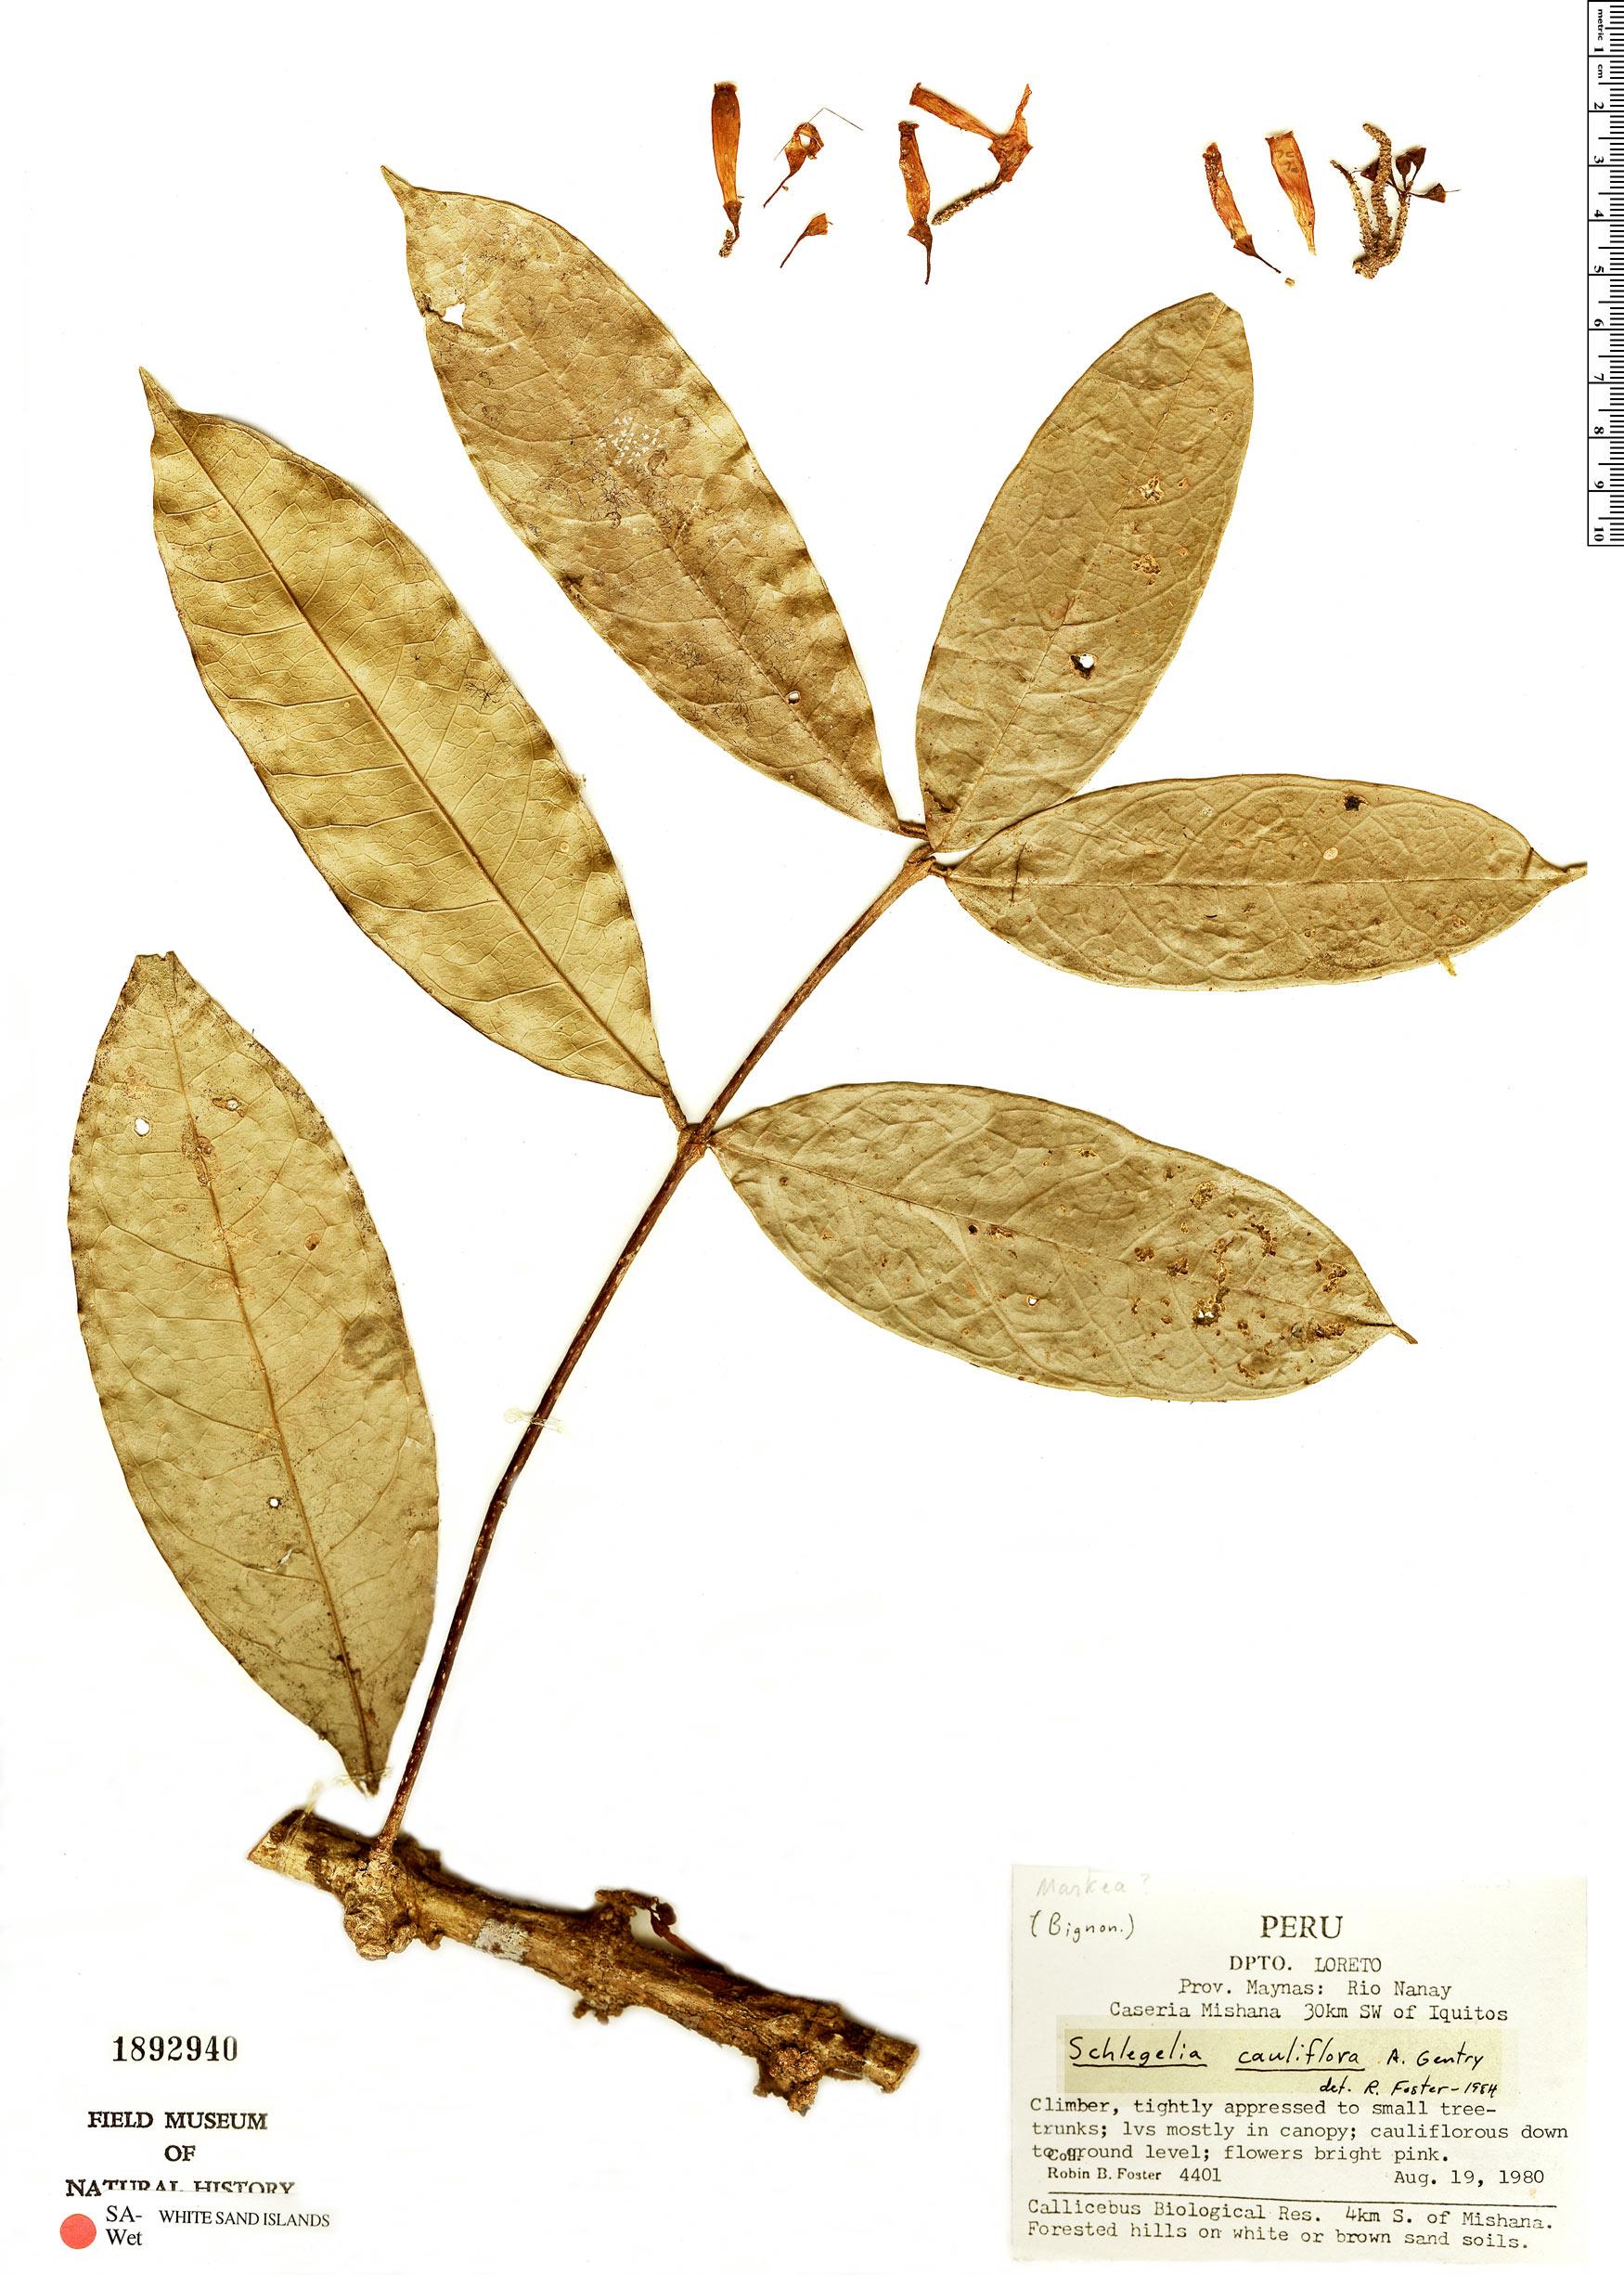 Specimen: Schlegelia cauliflora